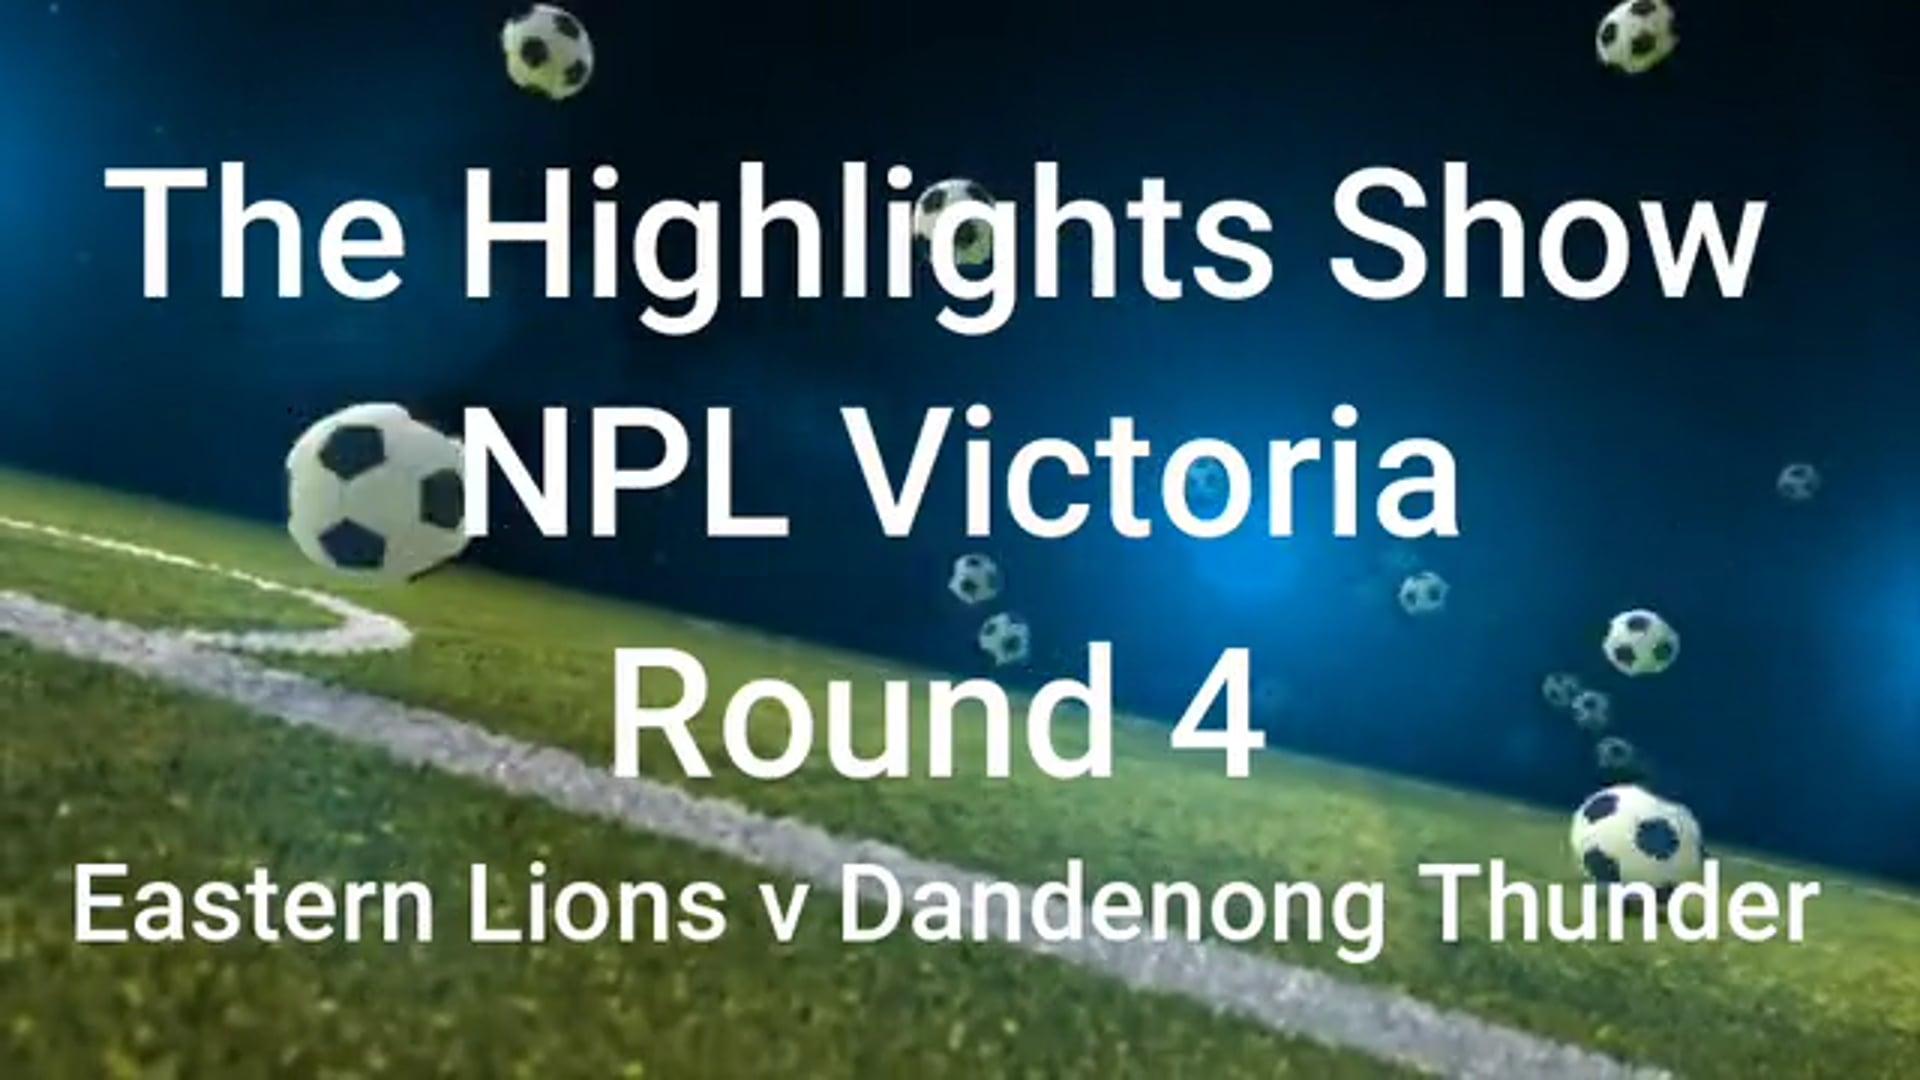 NPL Vic rd 4 Eastern Lions v Dandenong Thunder highlights